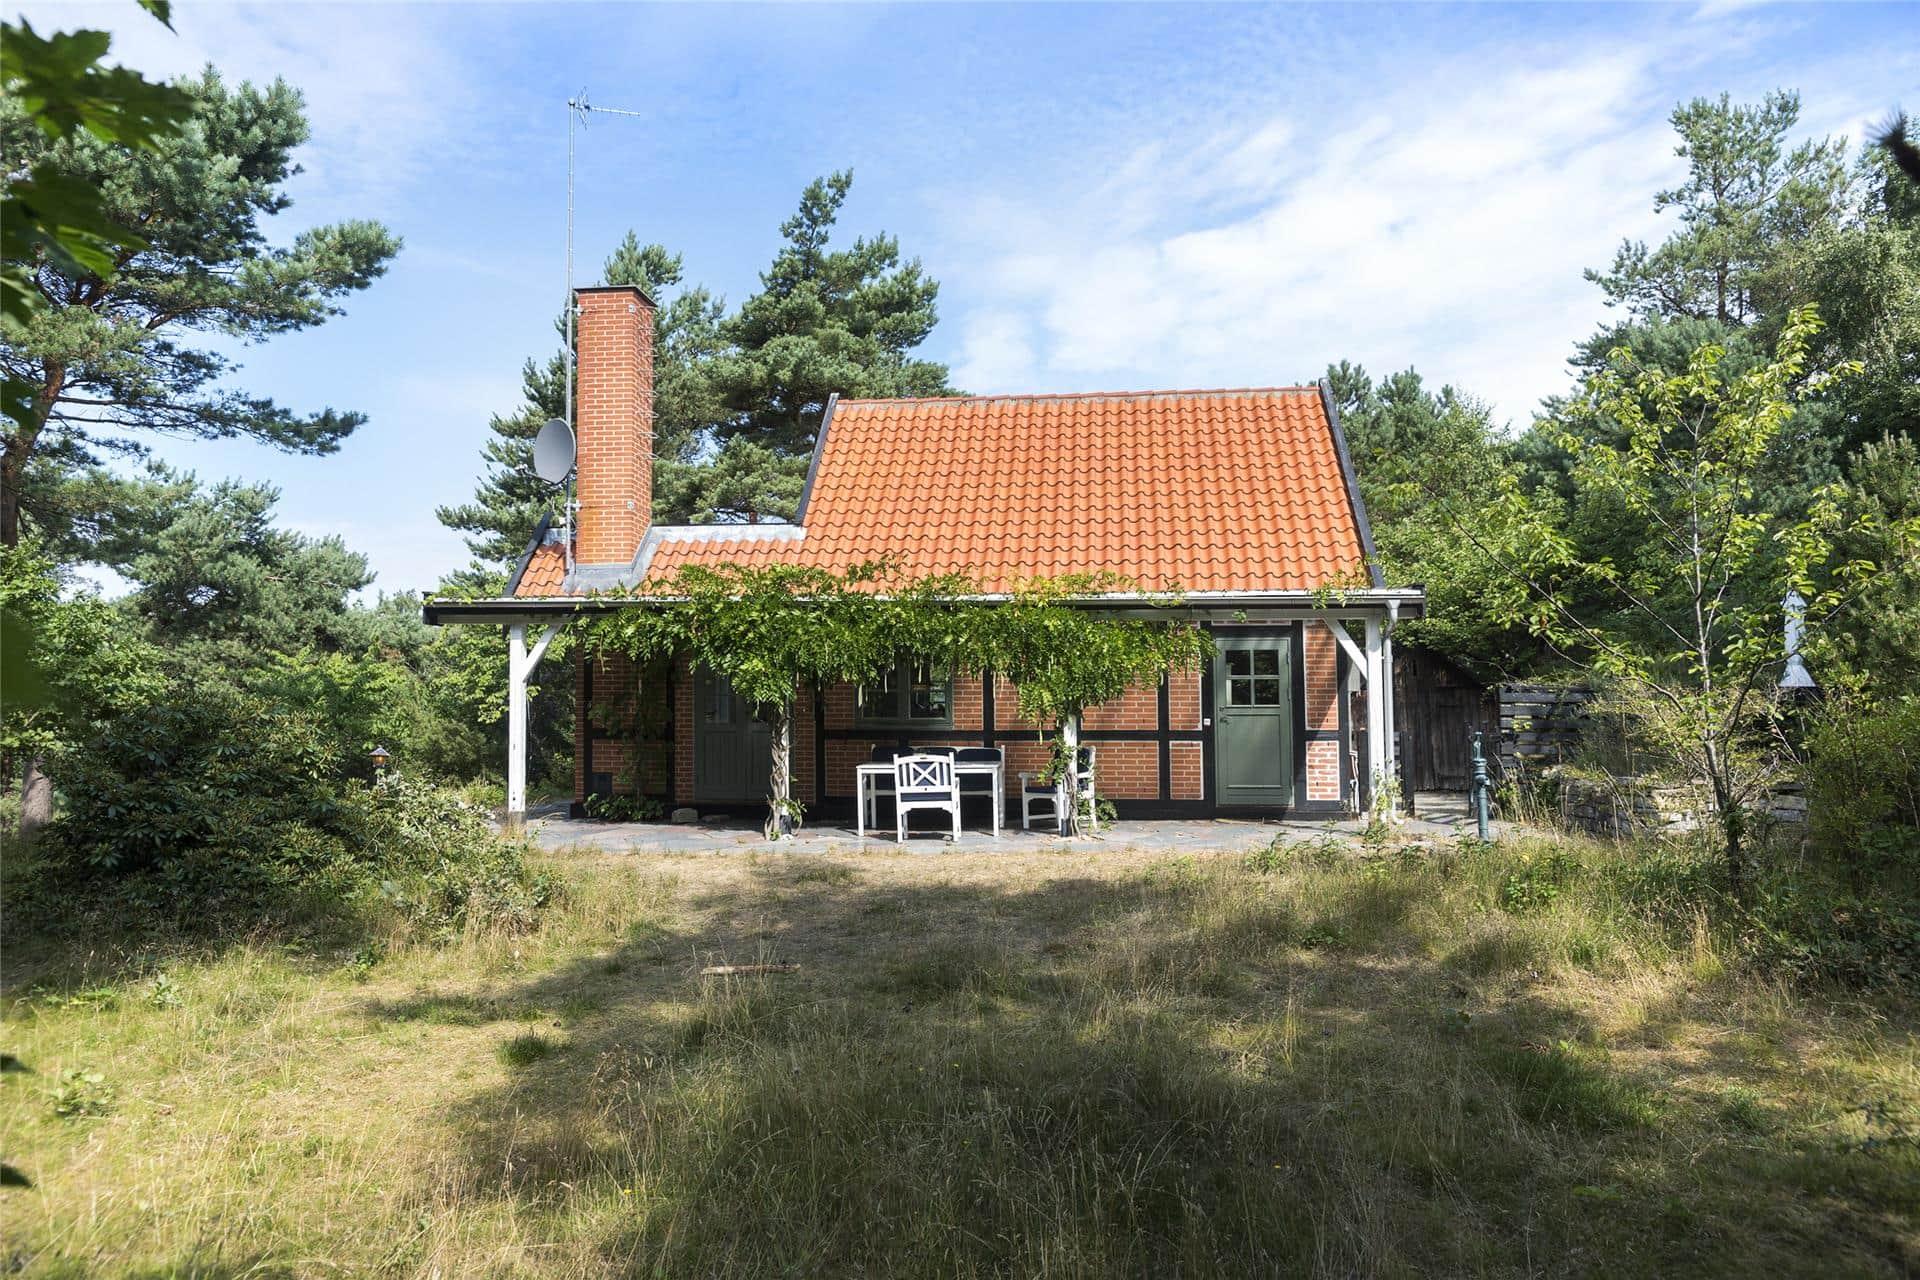 Bild 1-10 Ferienhaus 4603, Stampen Vej 3, DK - 3700 Rønne